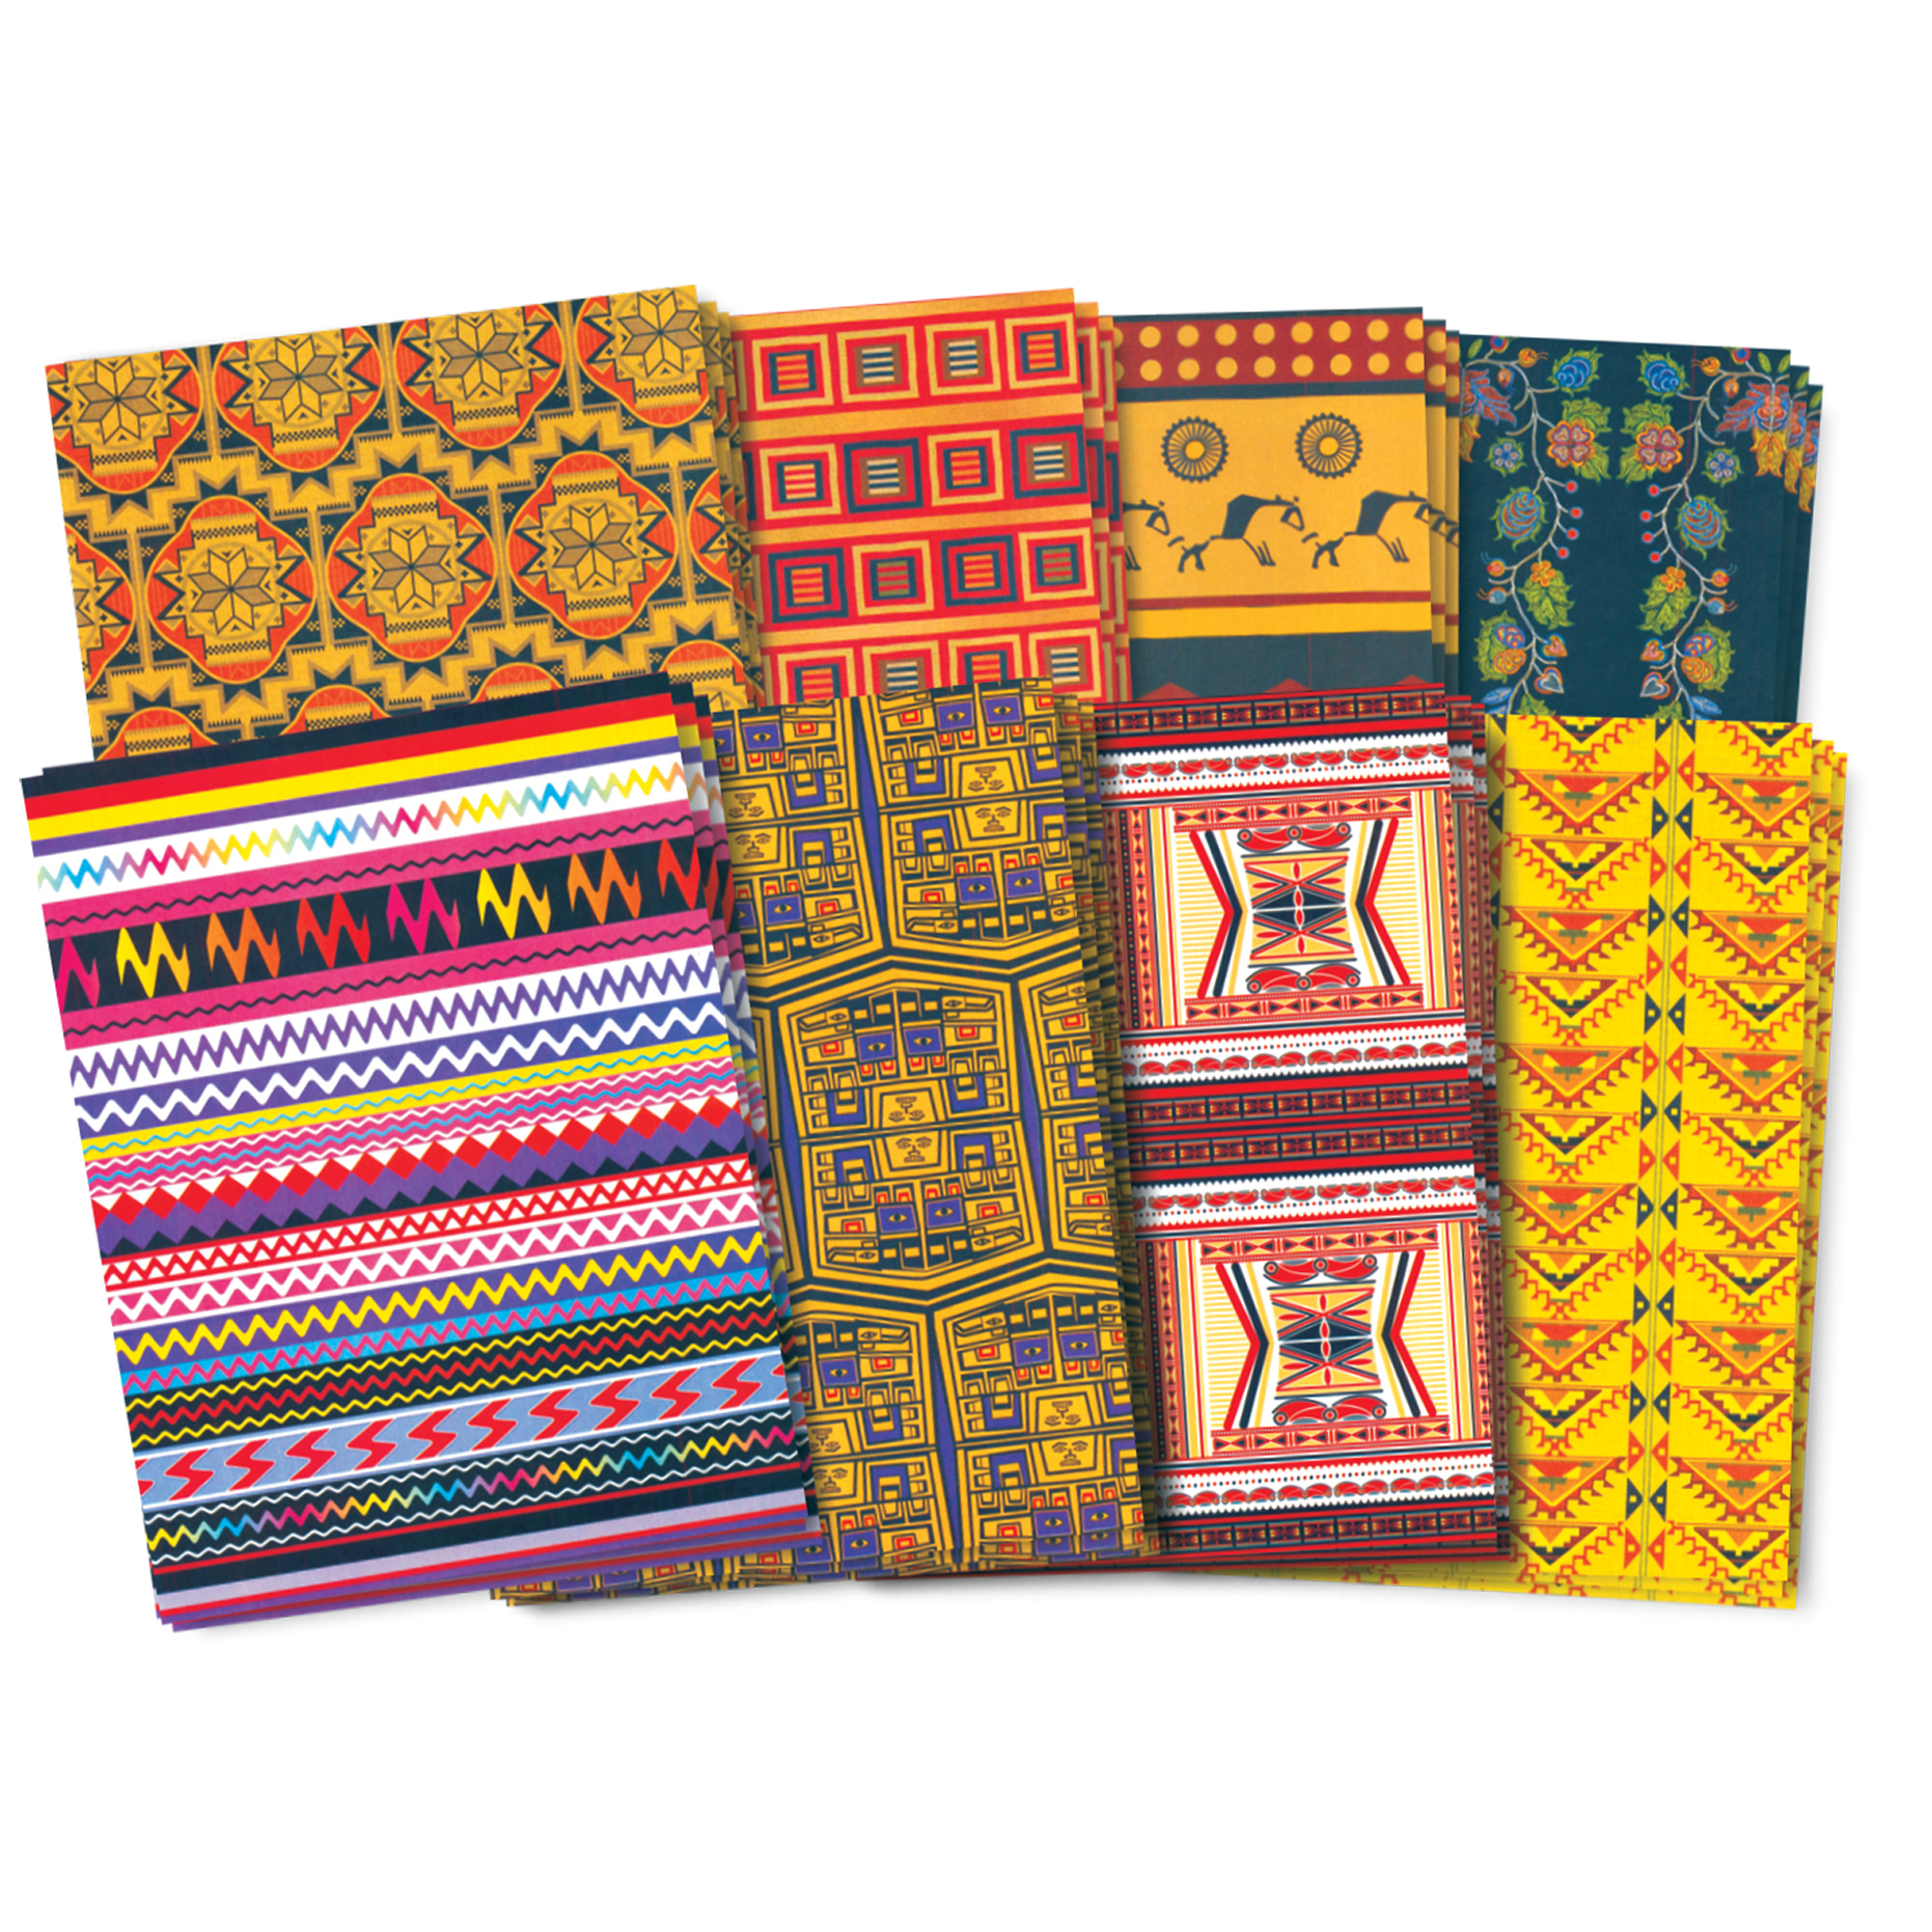 Roylco® Native American Craft Paper, 32 sheets/pkg, Set of 3 packs